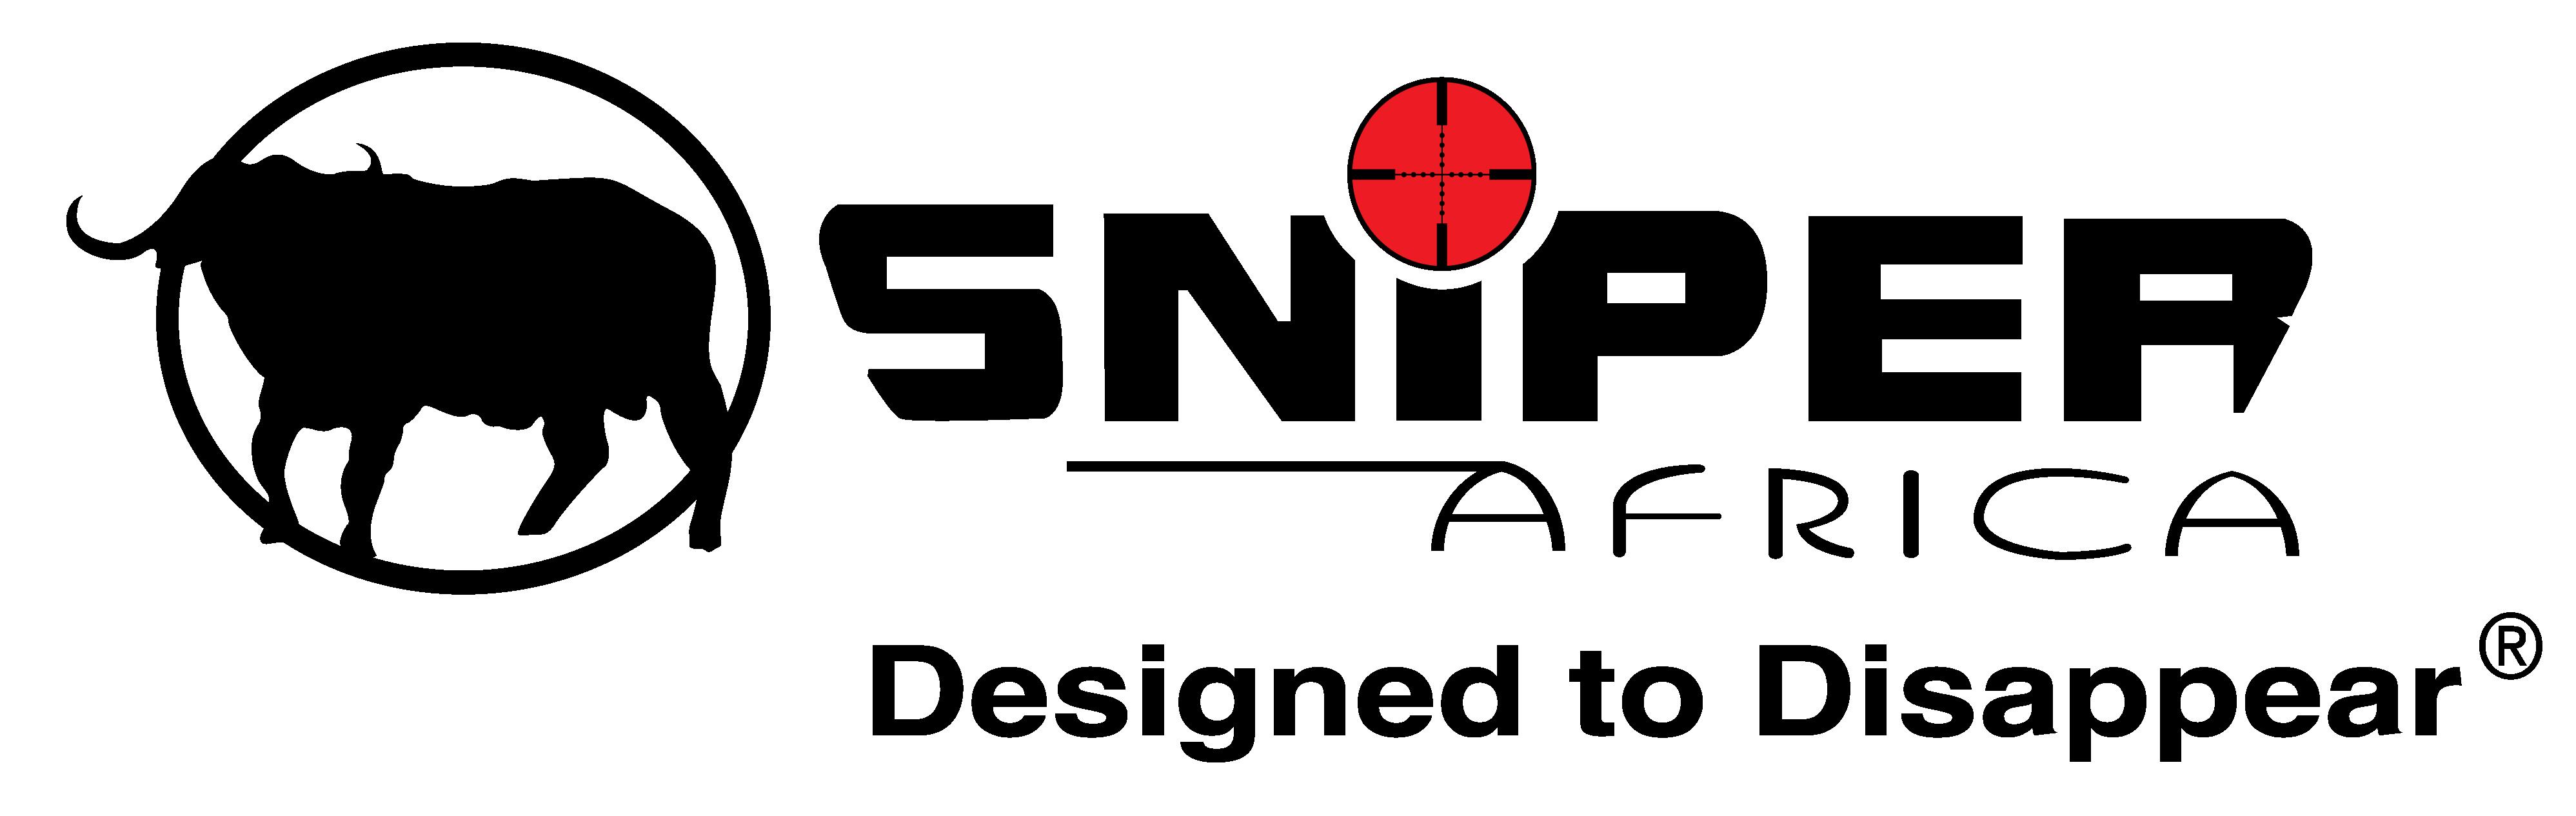 Sniper Africa